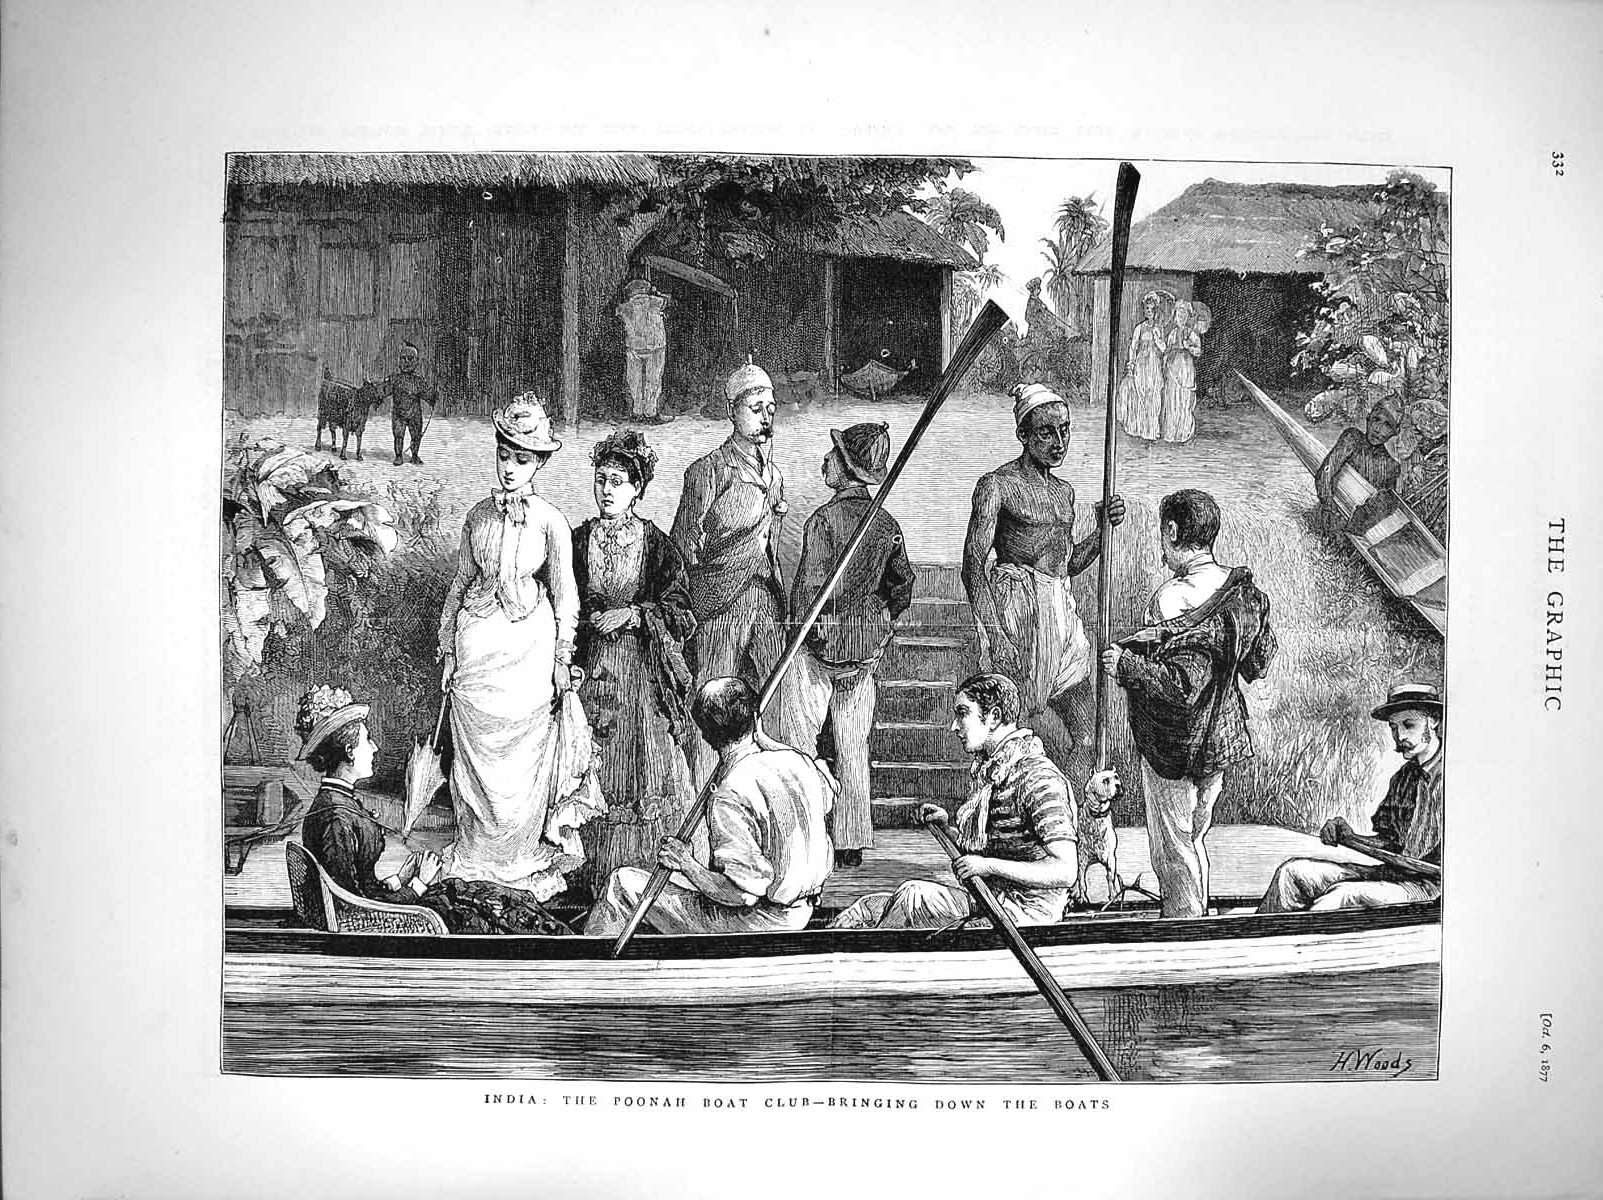 http://www.columbia.edu/itc/mealac/pritchett/00routesdata/1800_1899/britishrule/incountry/graphic1877.jpg